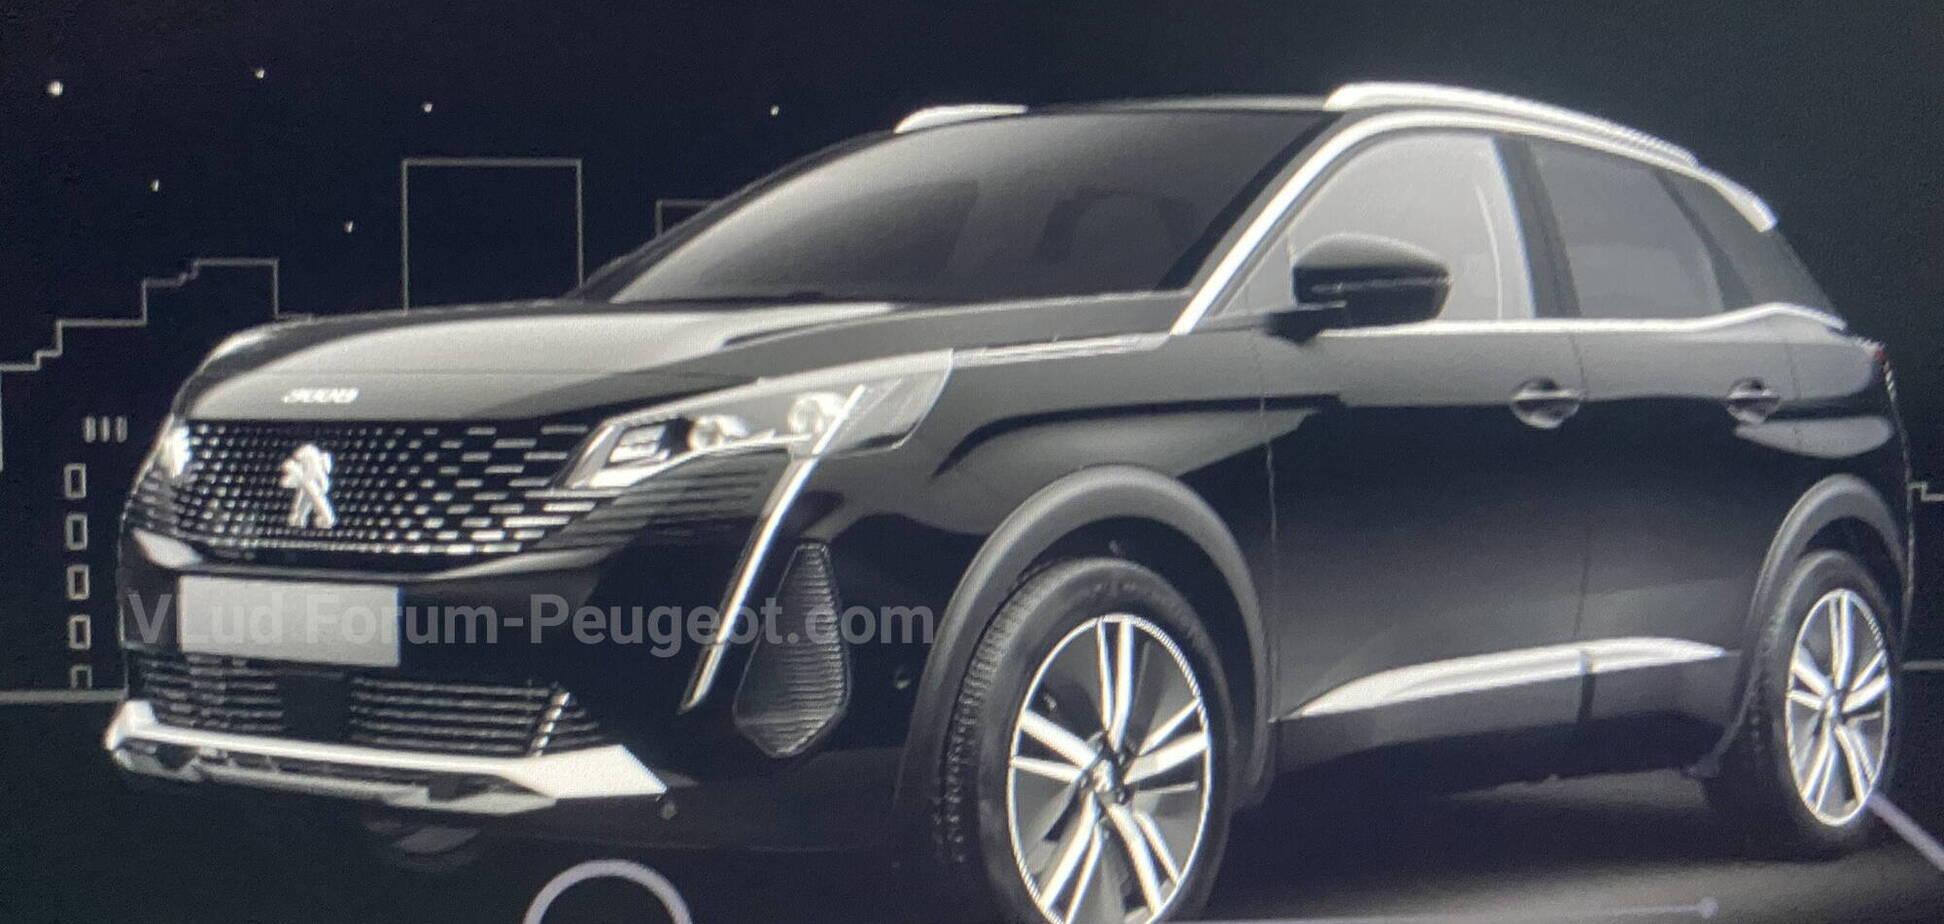 Так буде виглядати новий Peugeot 3008. Фото: forum-peugeot.com